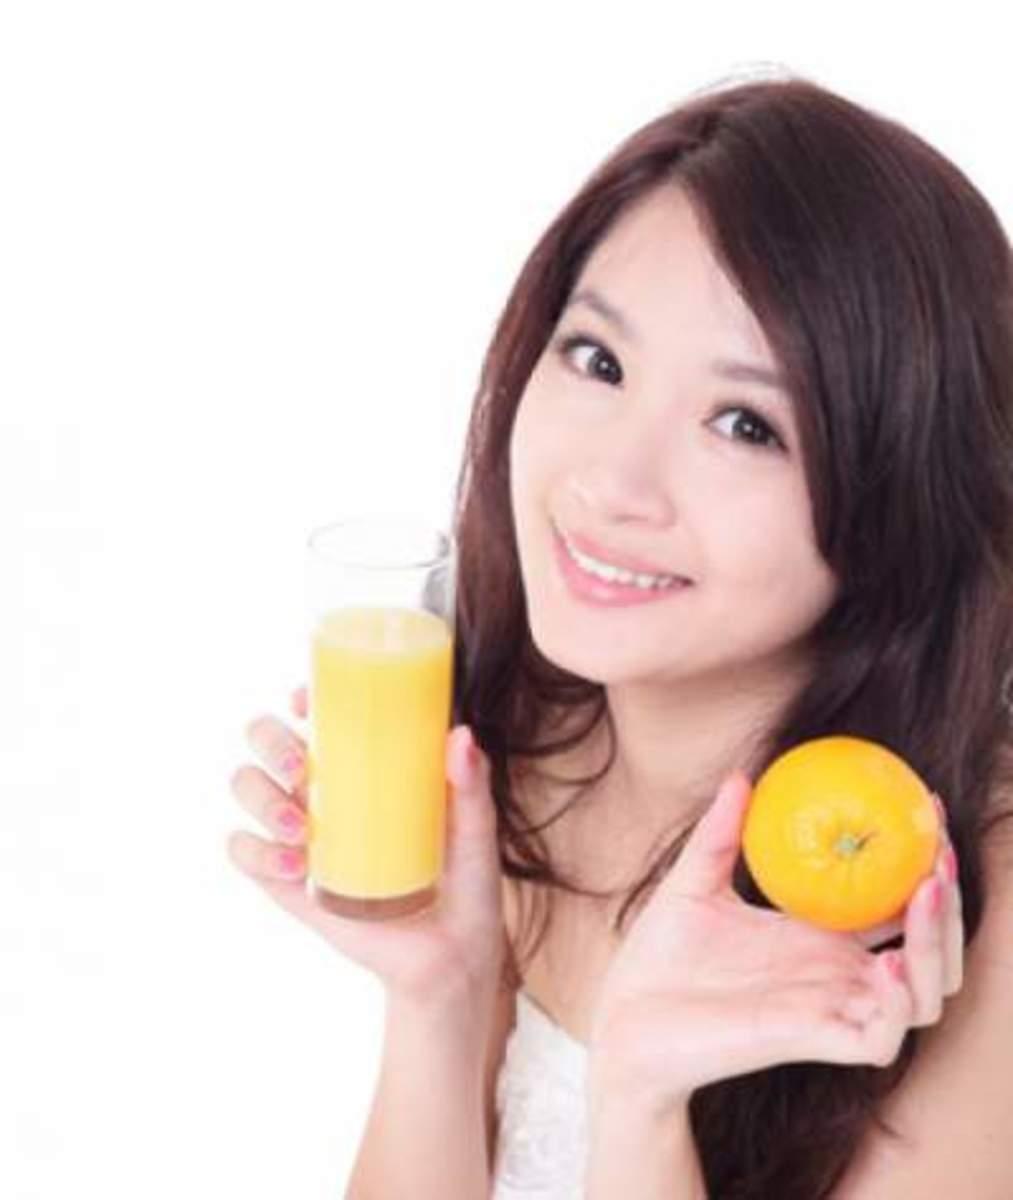 Does vitamin C lighten the skin?